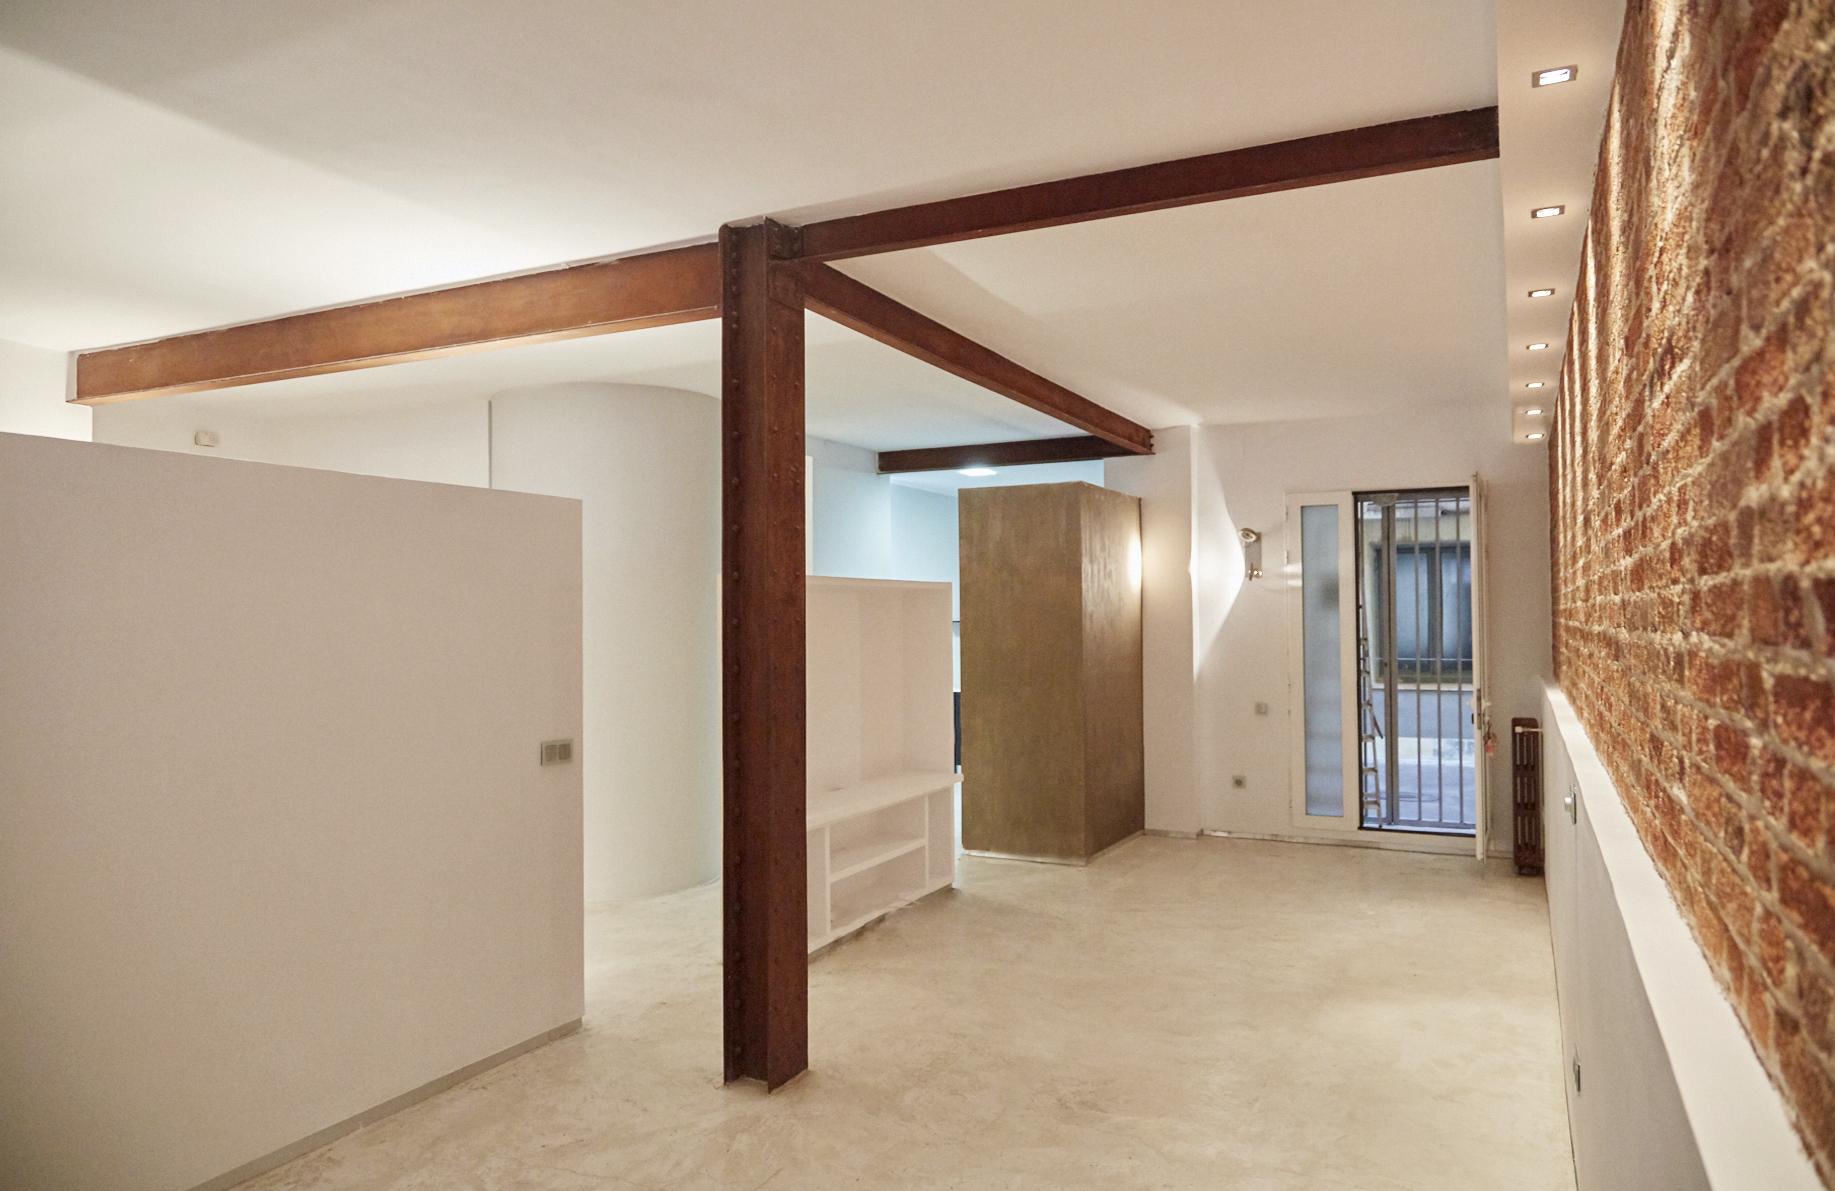 Loft en Santa Engracia Madrid